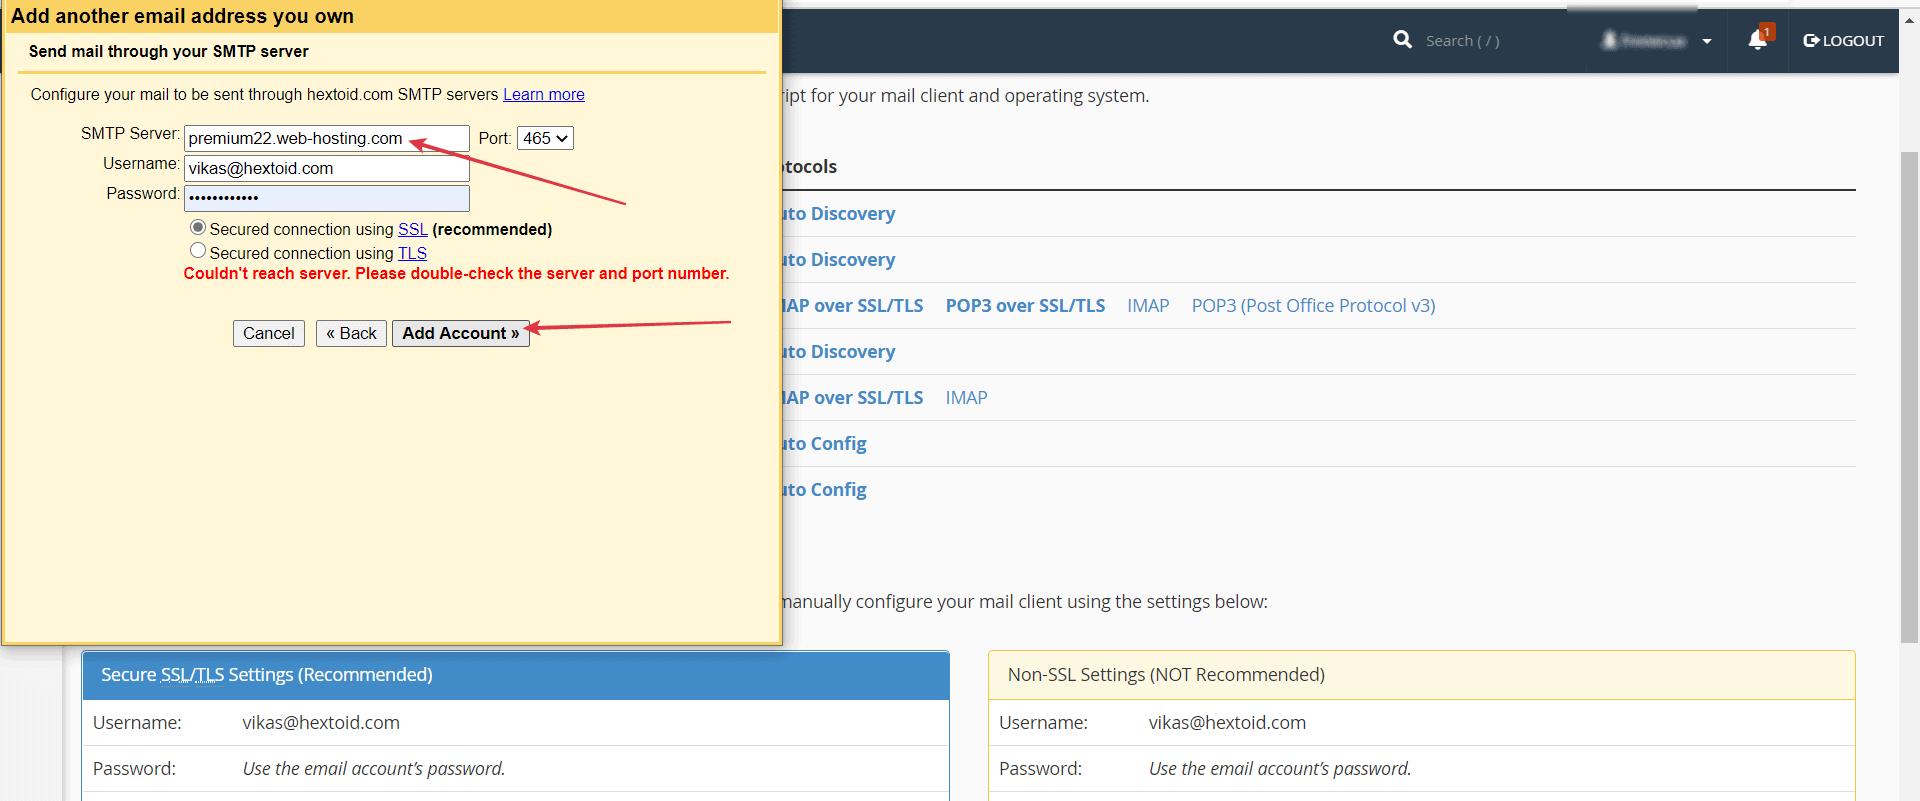 Change the SMTP Server